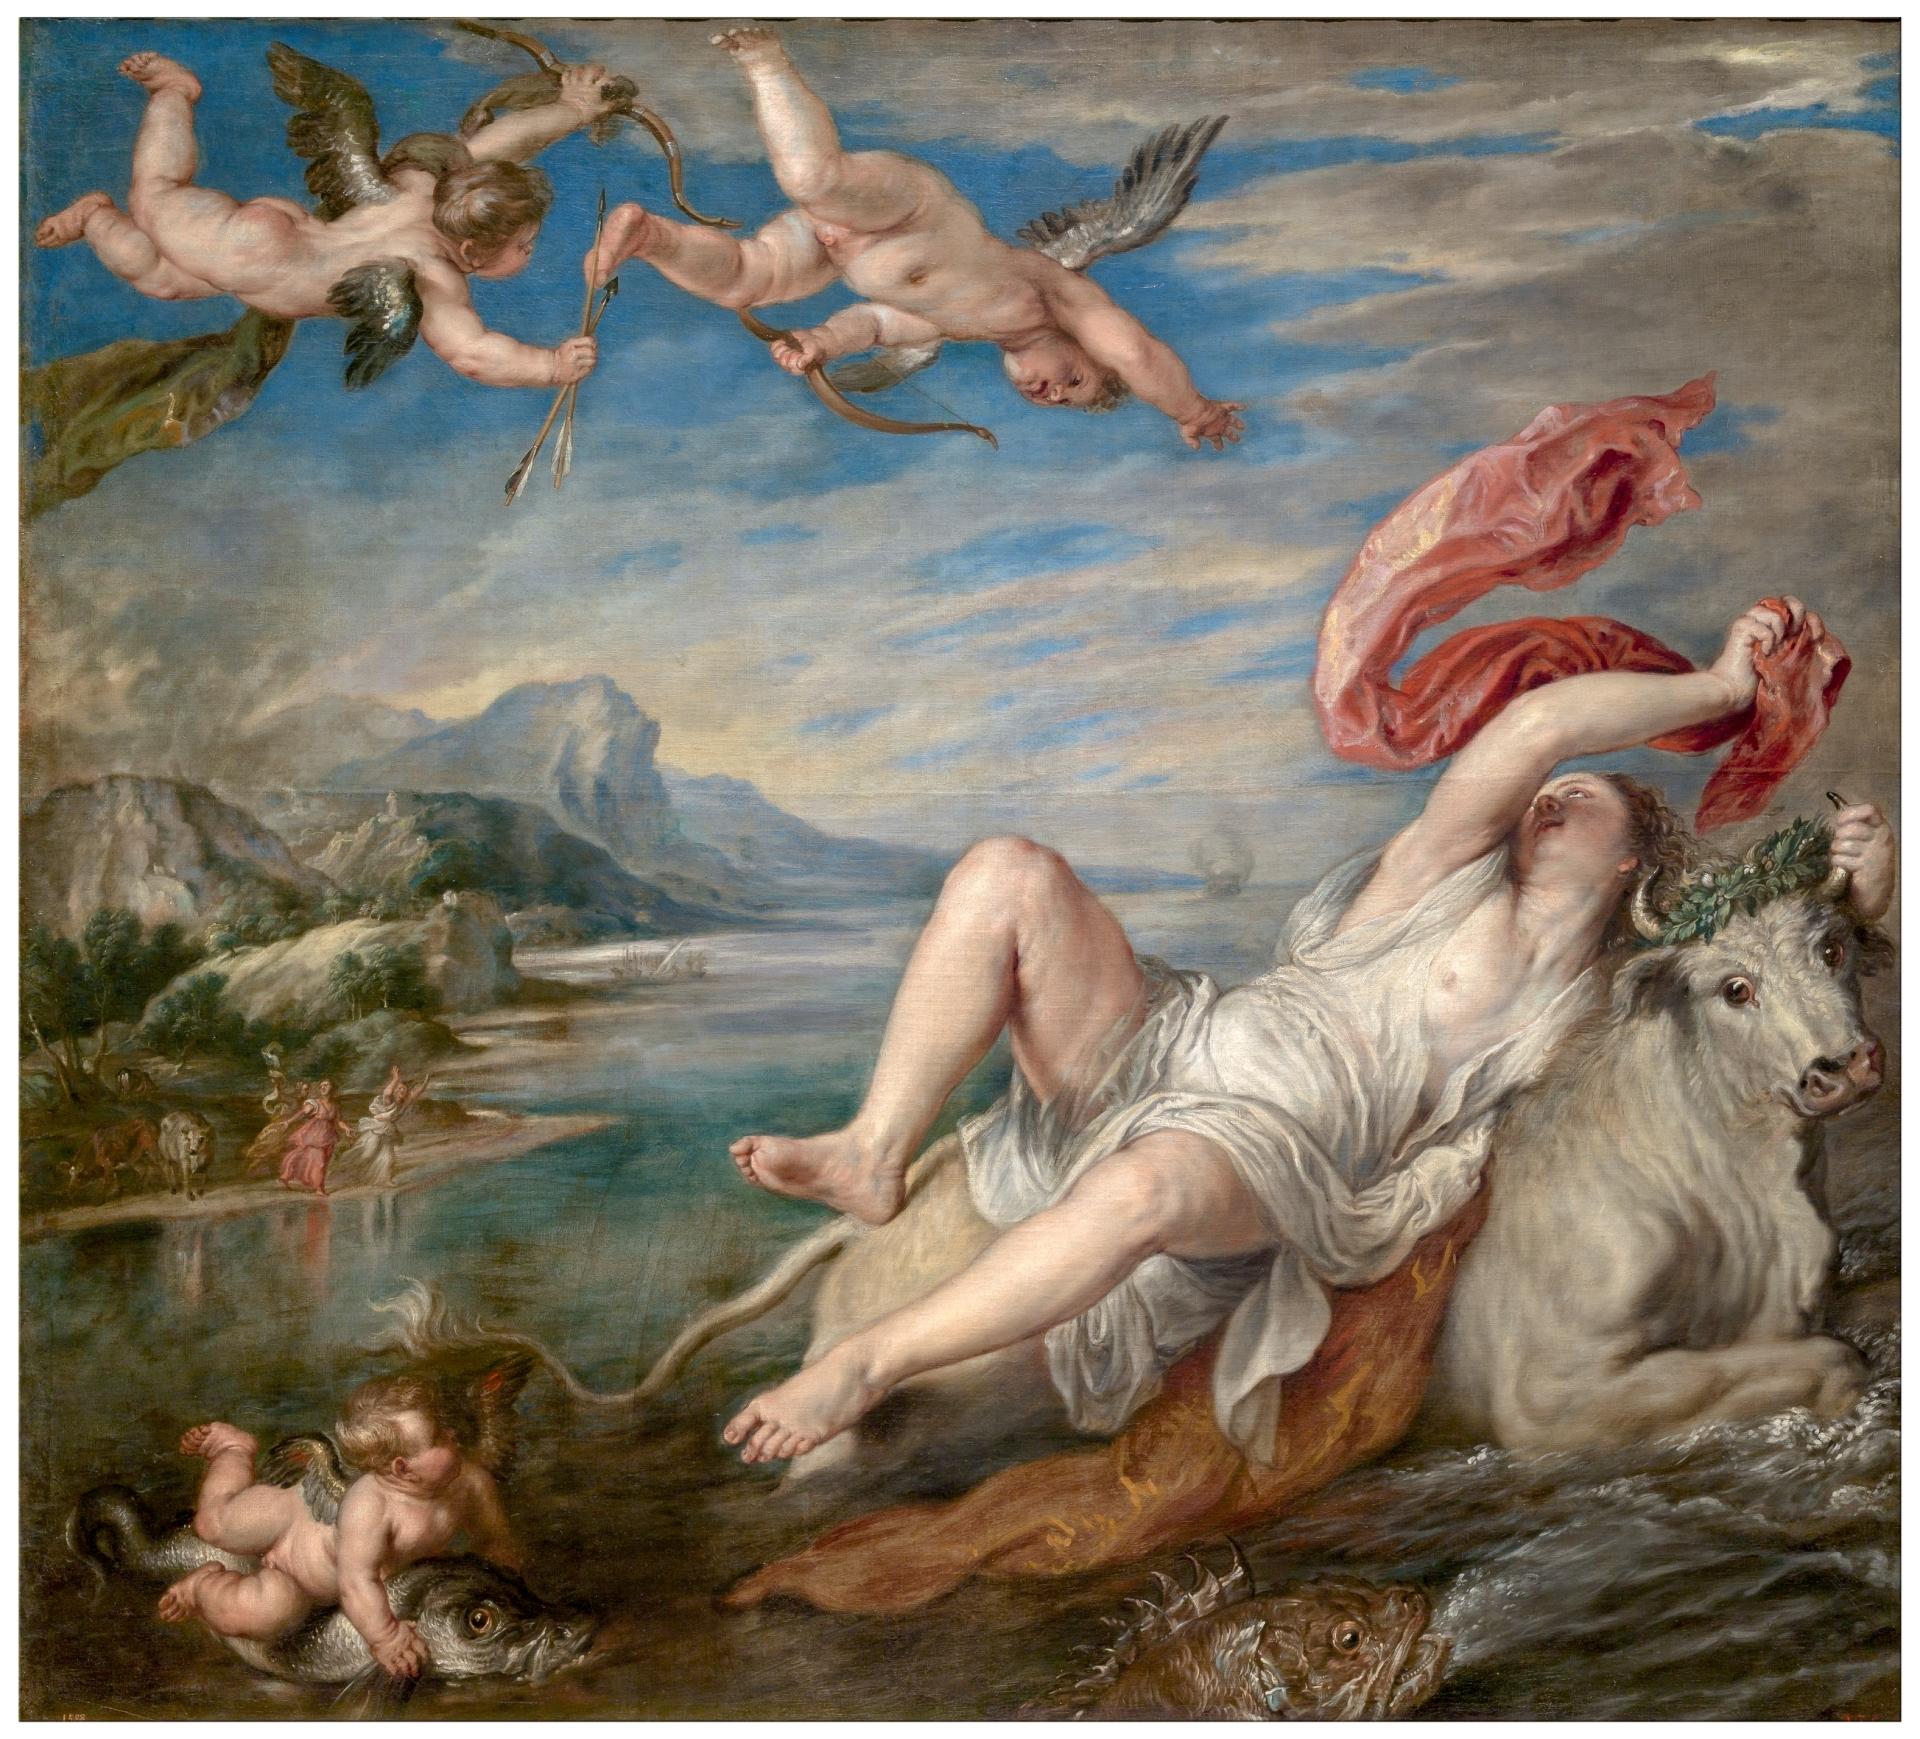 The Rape of Europe - The Collection - Museo Nacional del Prado